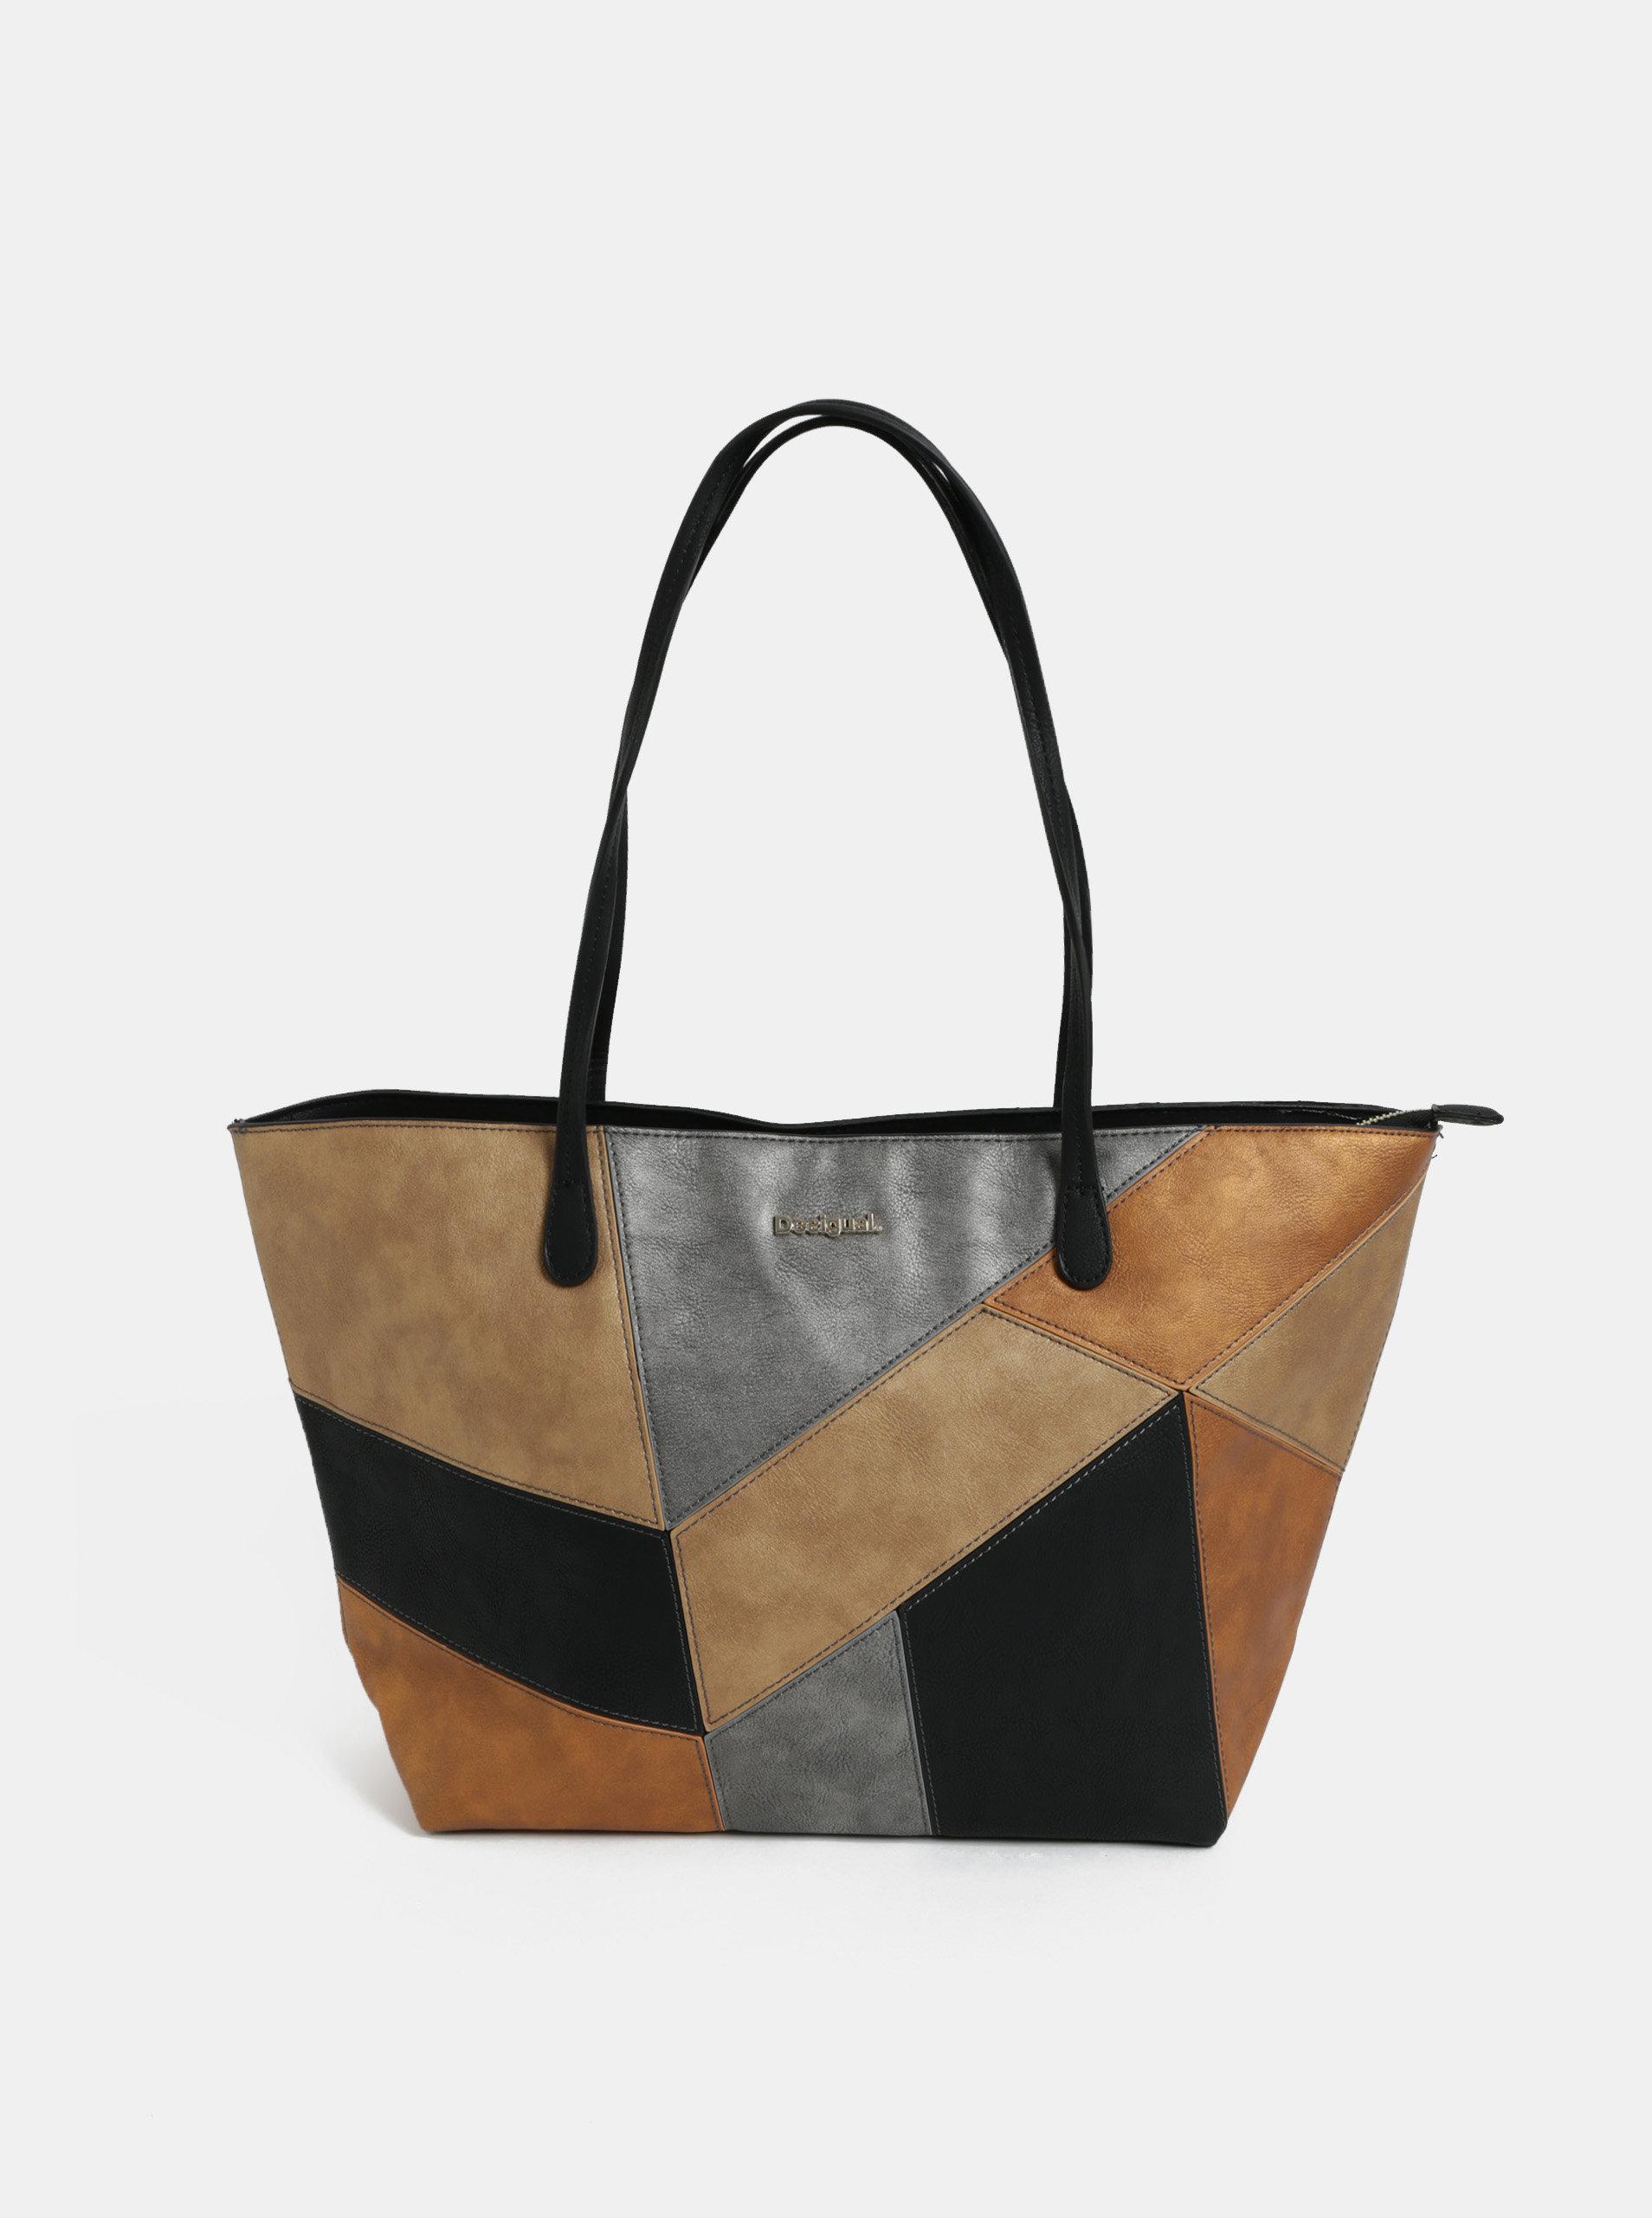 Černo-hnědá koženková kabelka Desigual Ares